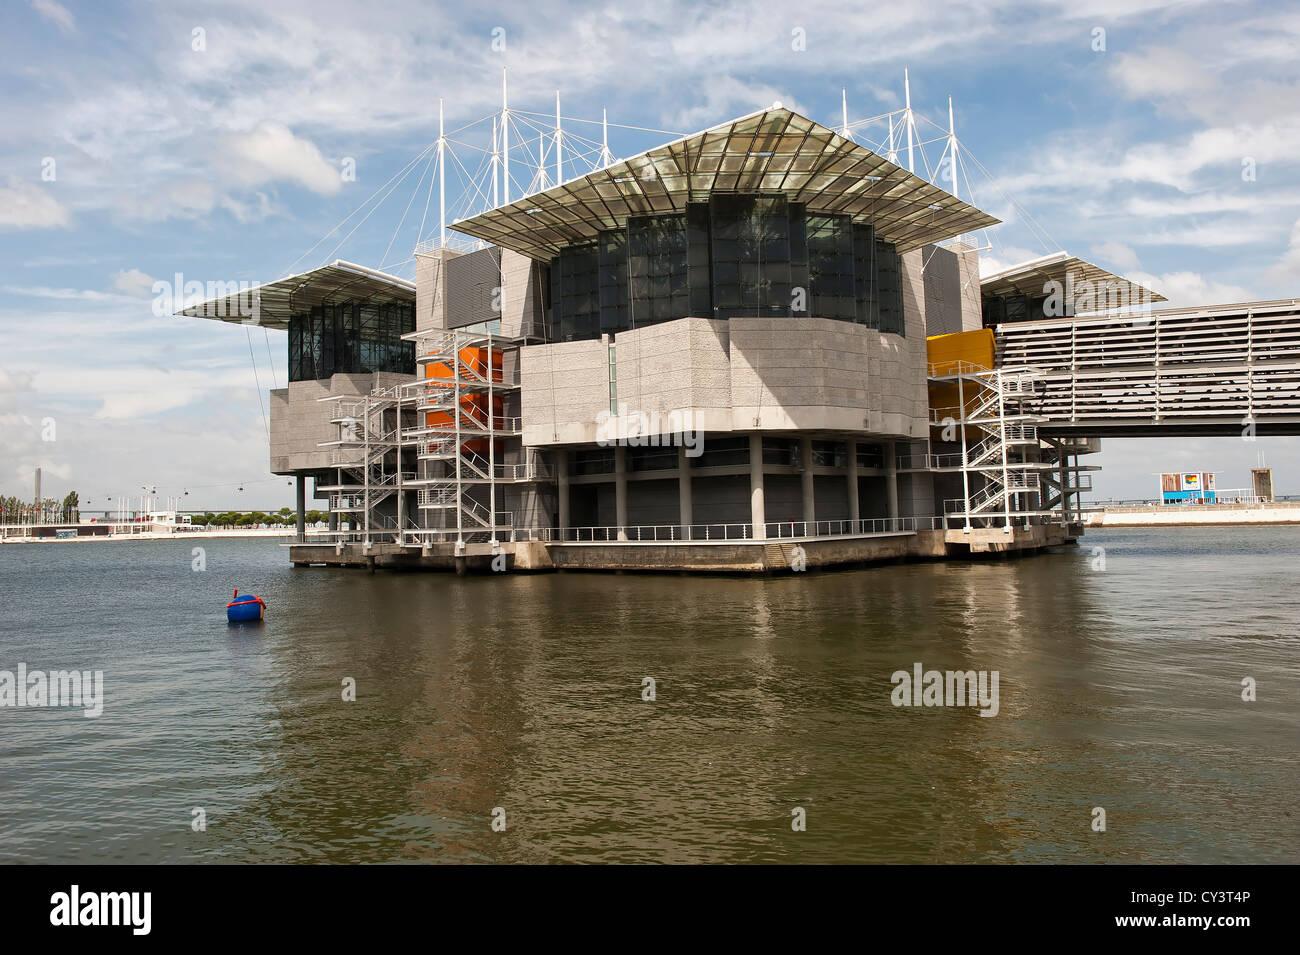 Oceanario (Aquarium), Parque das Naçoes (Park of the Nations), Lisbon, Portugal Stock Photo